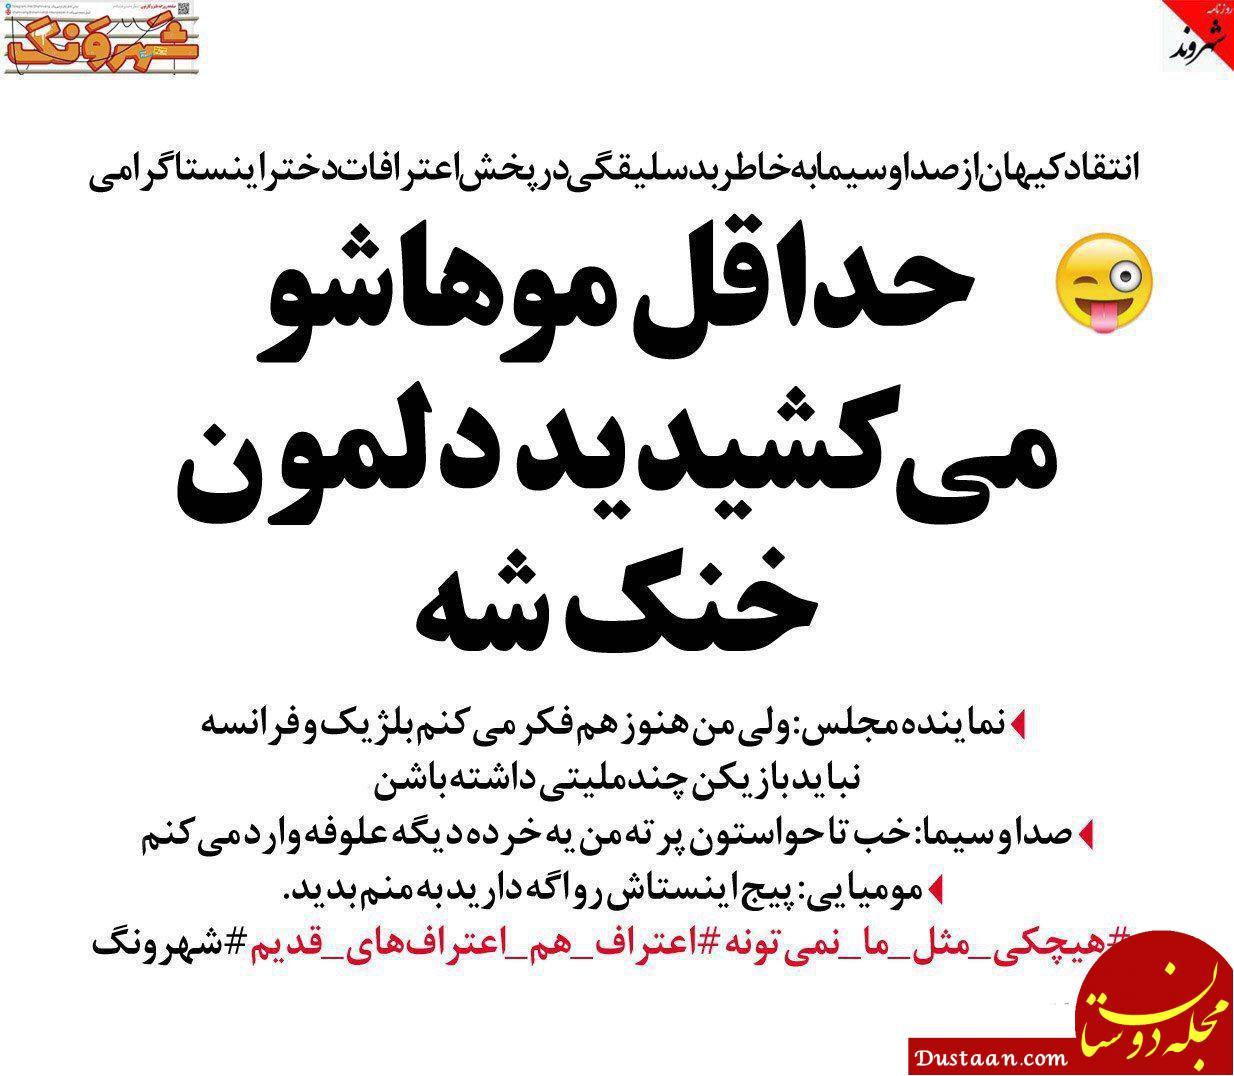 www.dustaan.com متلک جالب یک روزنامه به کیهان درباره دختر اینستاگرامی!